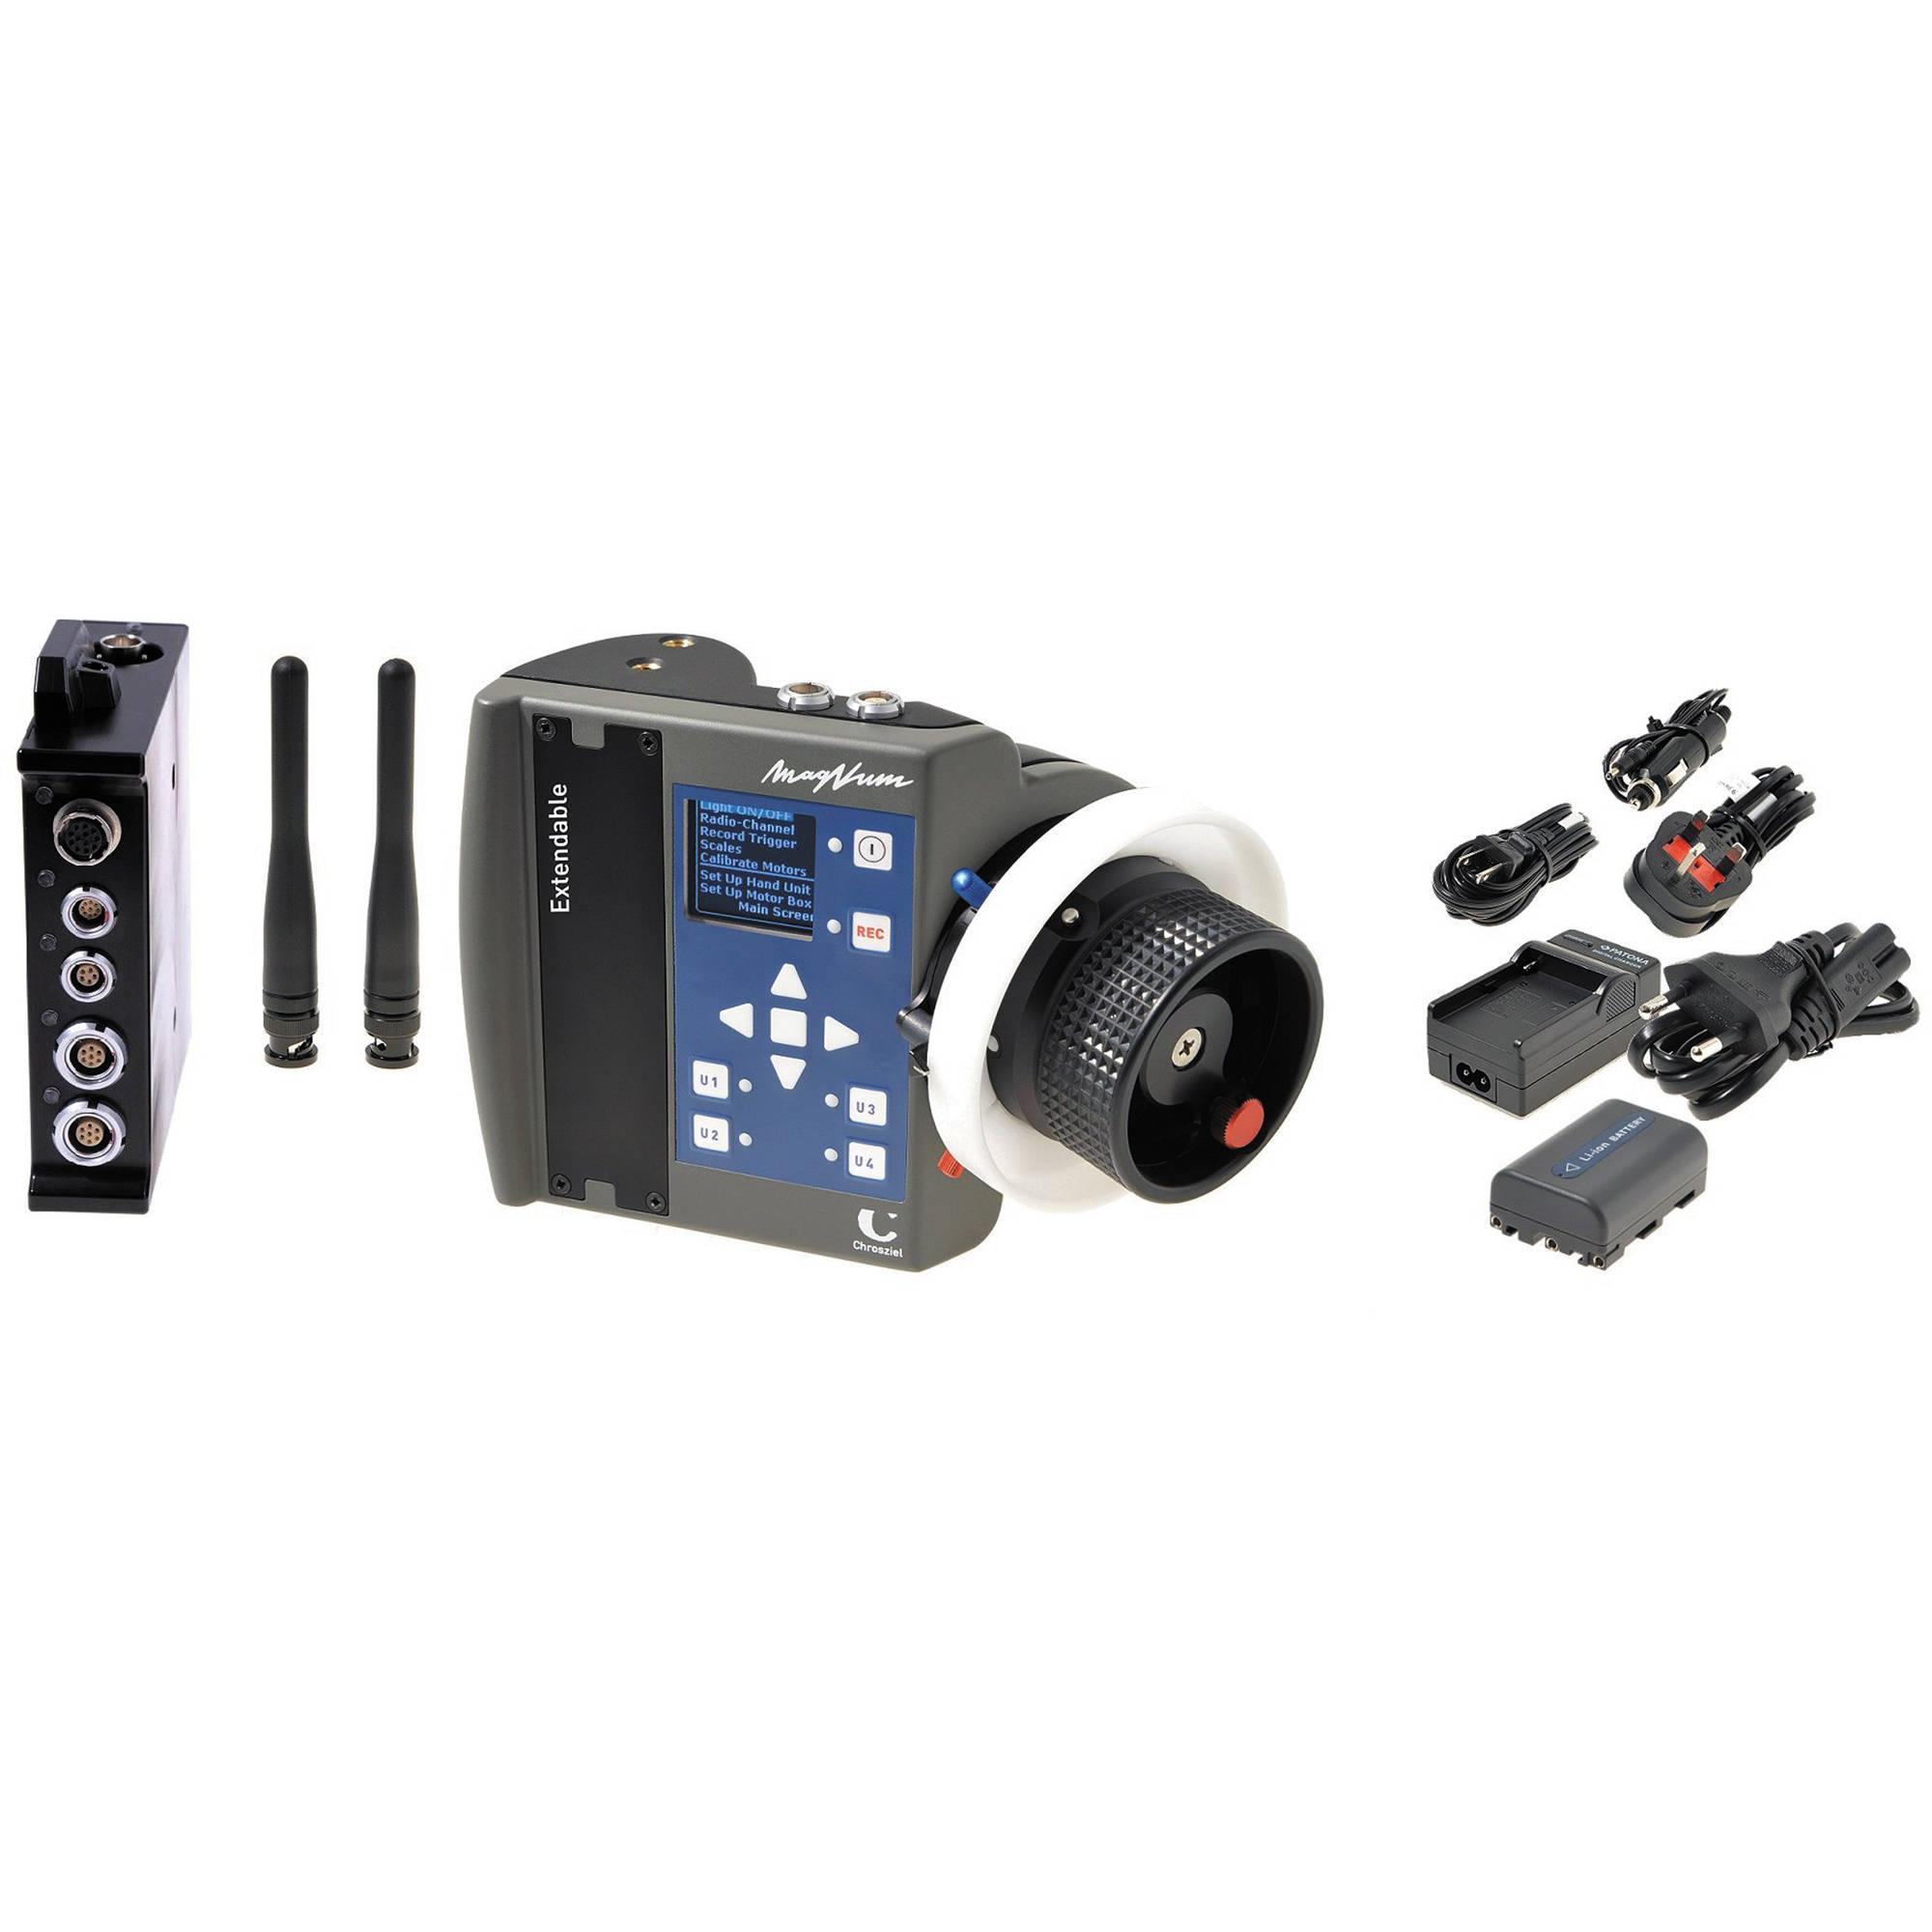 Chrosziel MN-150 MagNum Extendable Wireless Lens Control ...